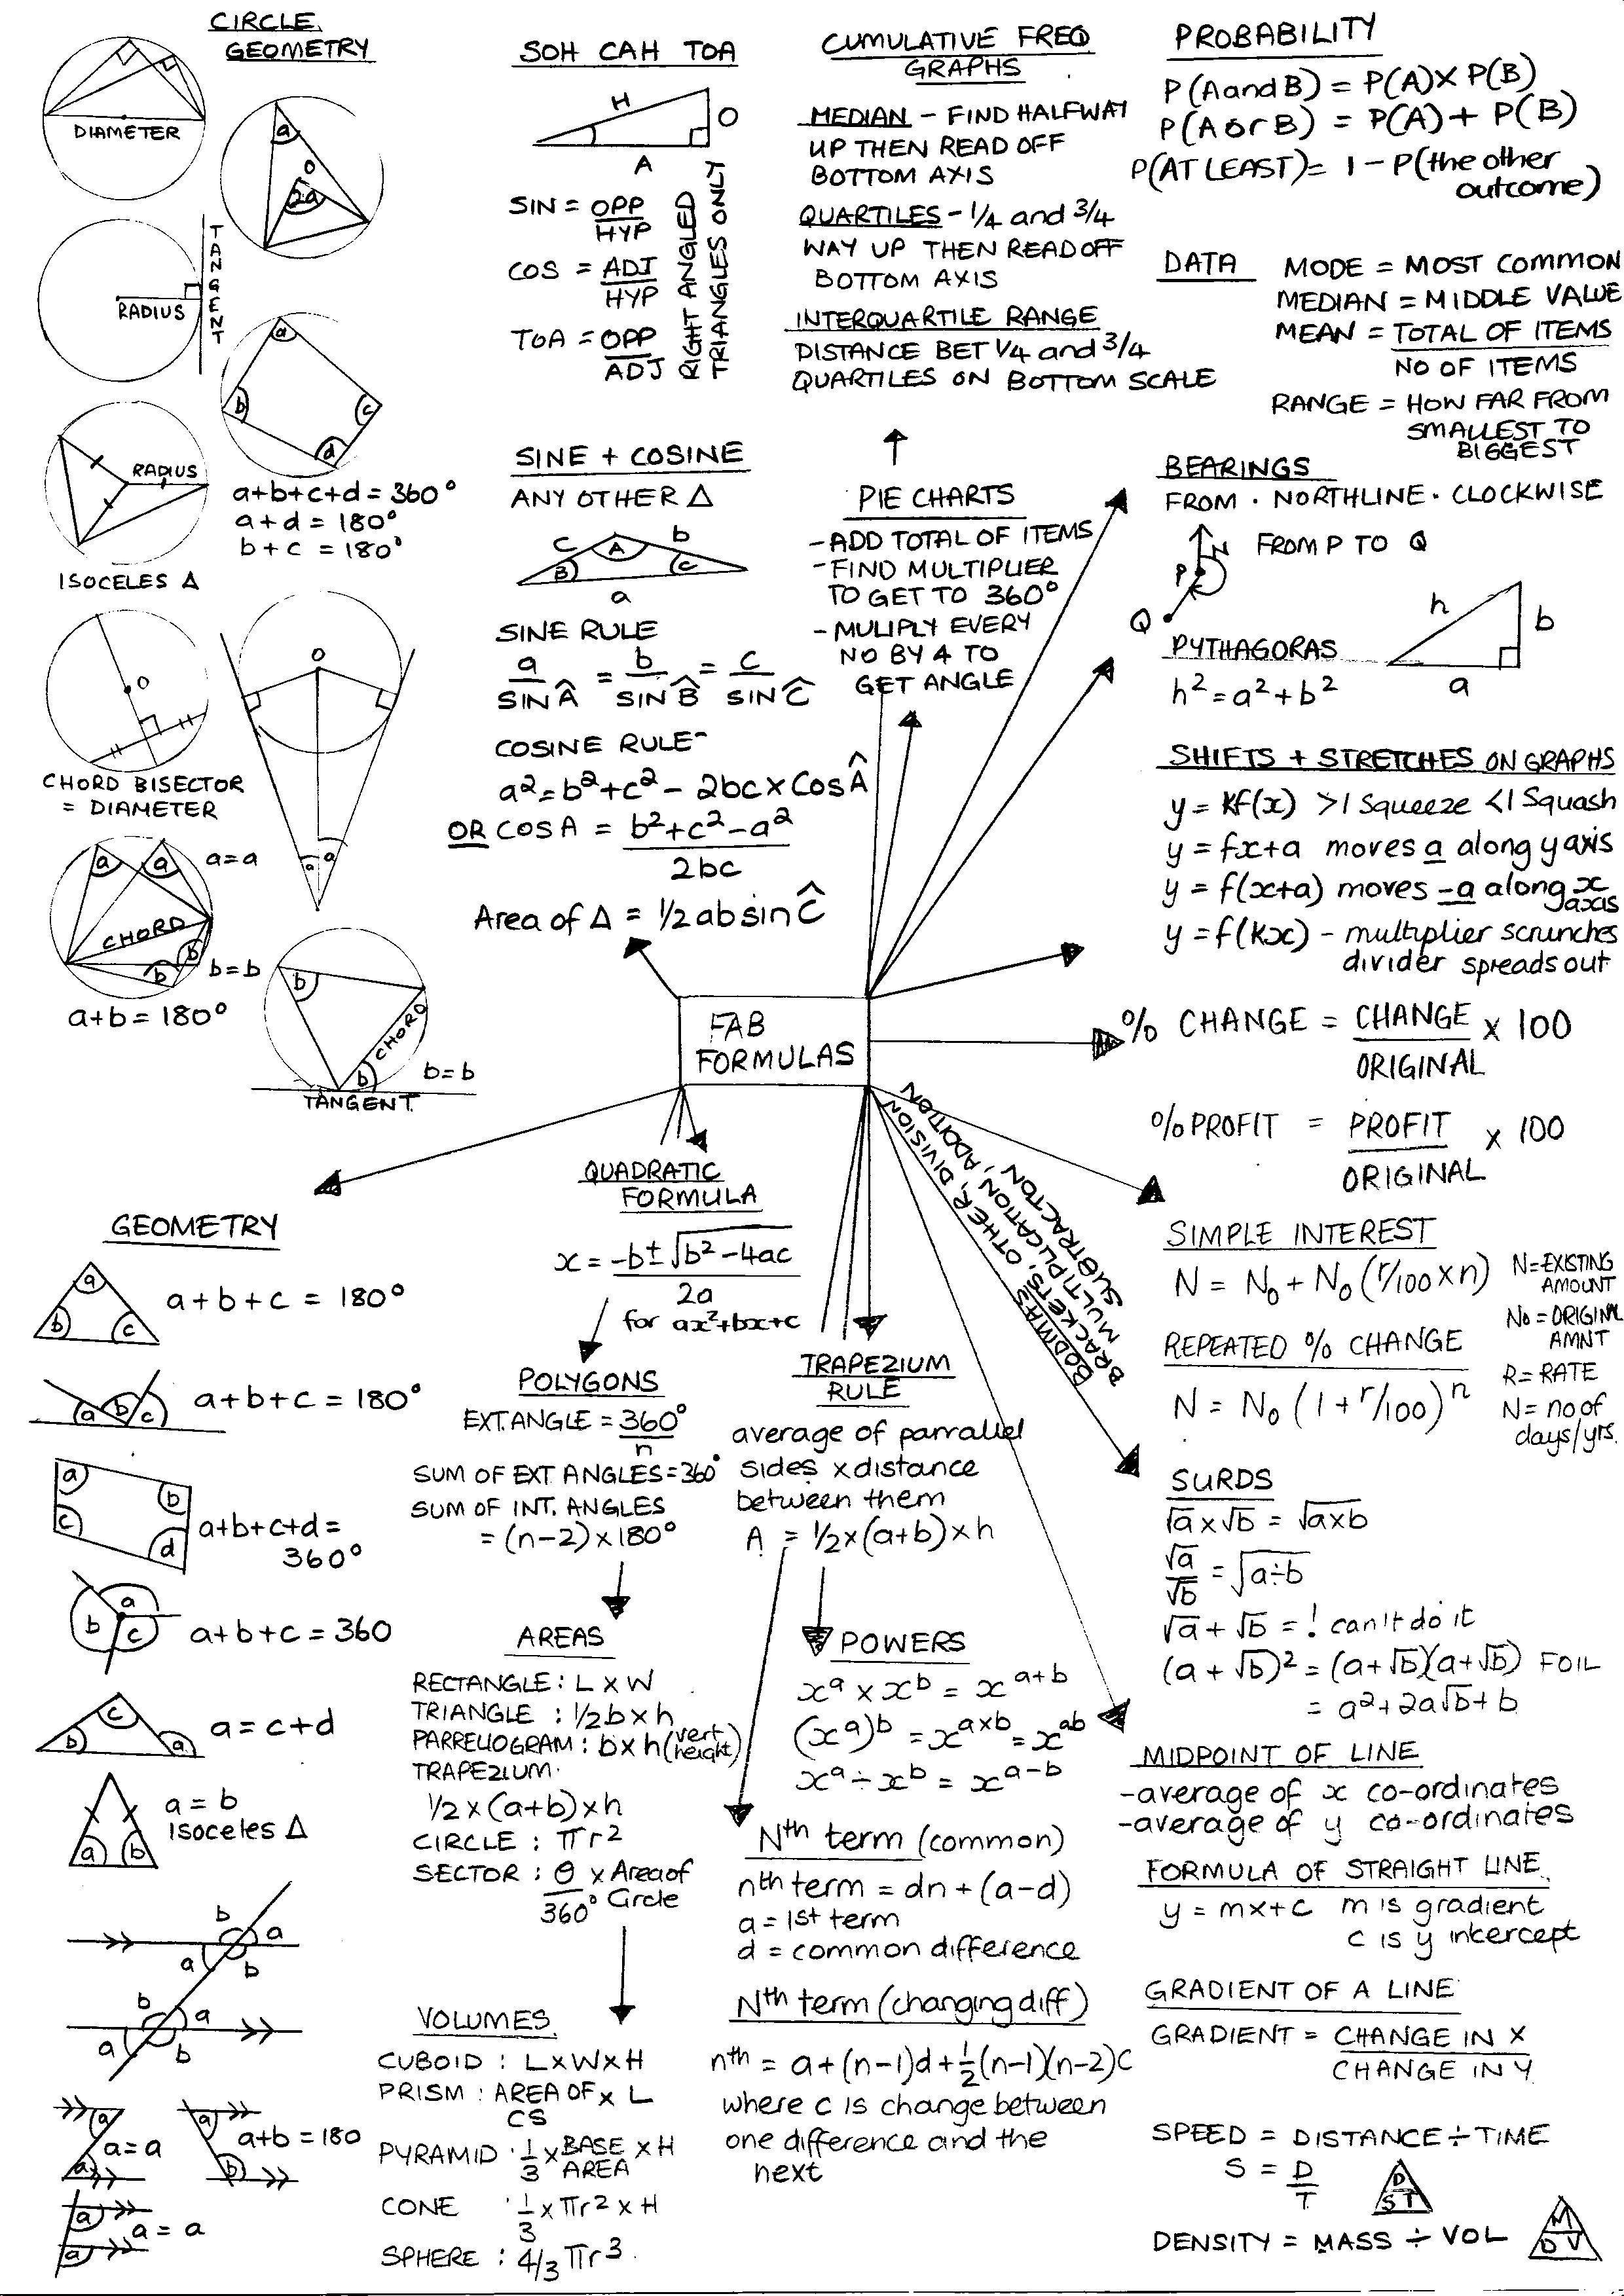 Igcse maths revision notes pdf